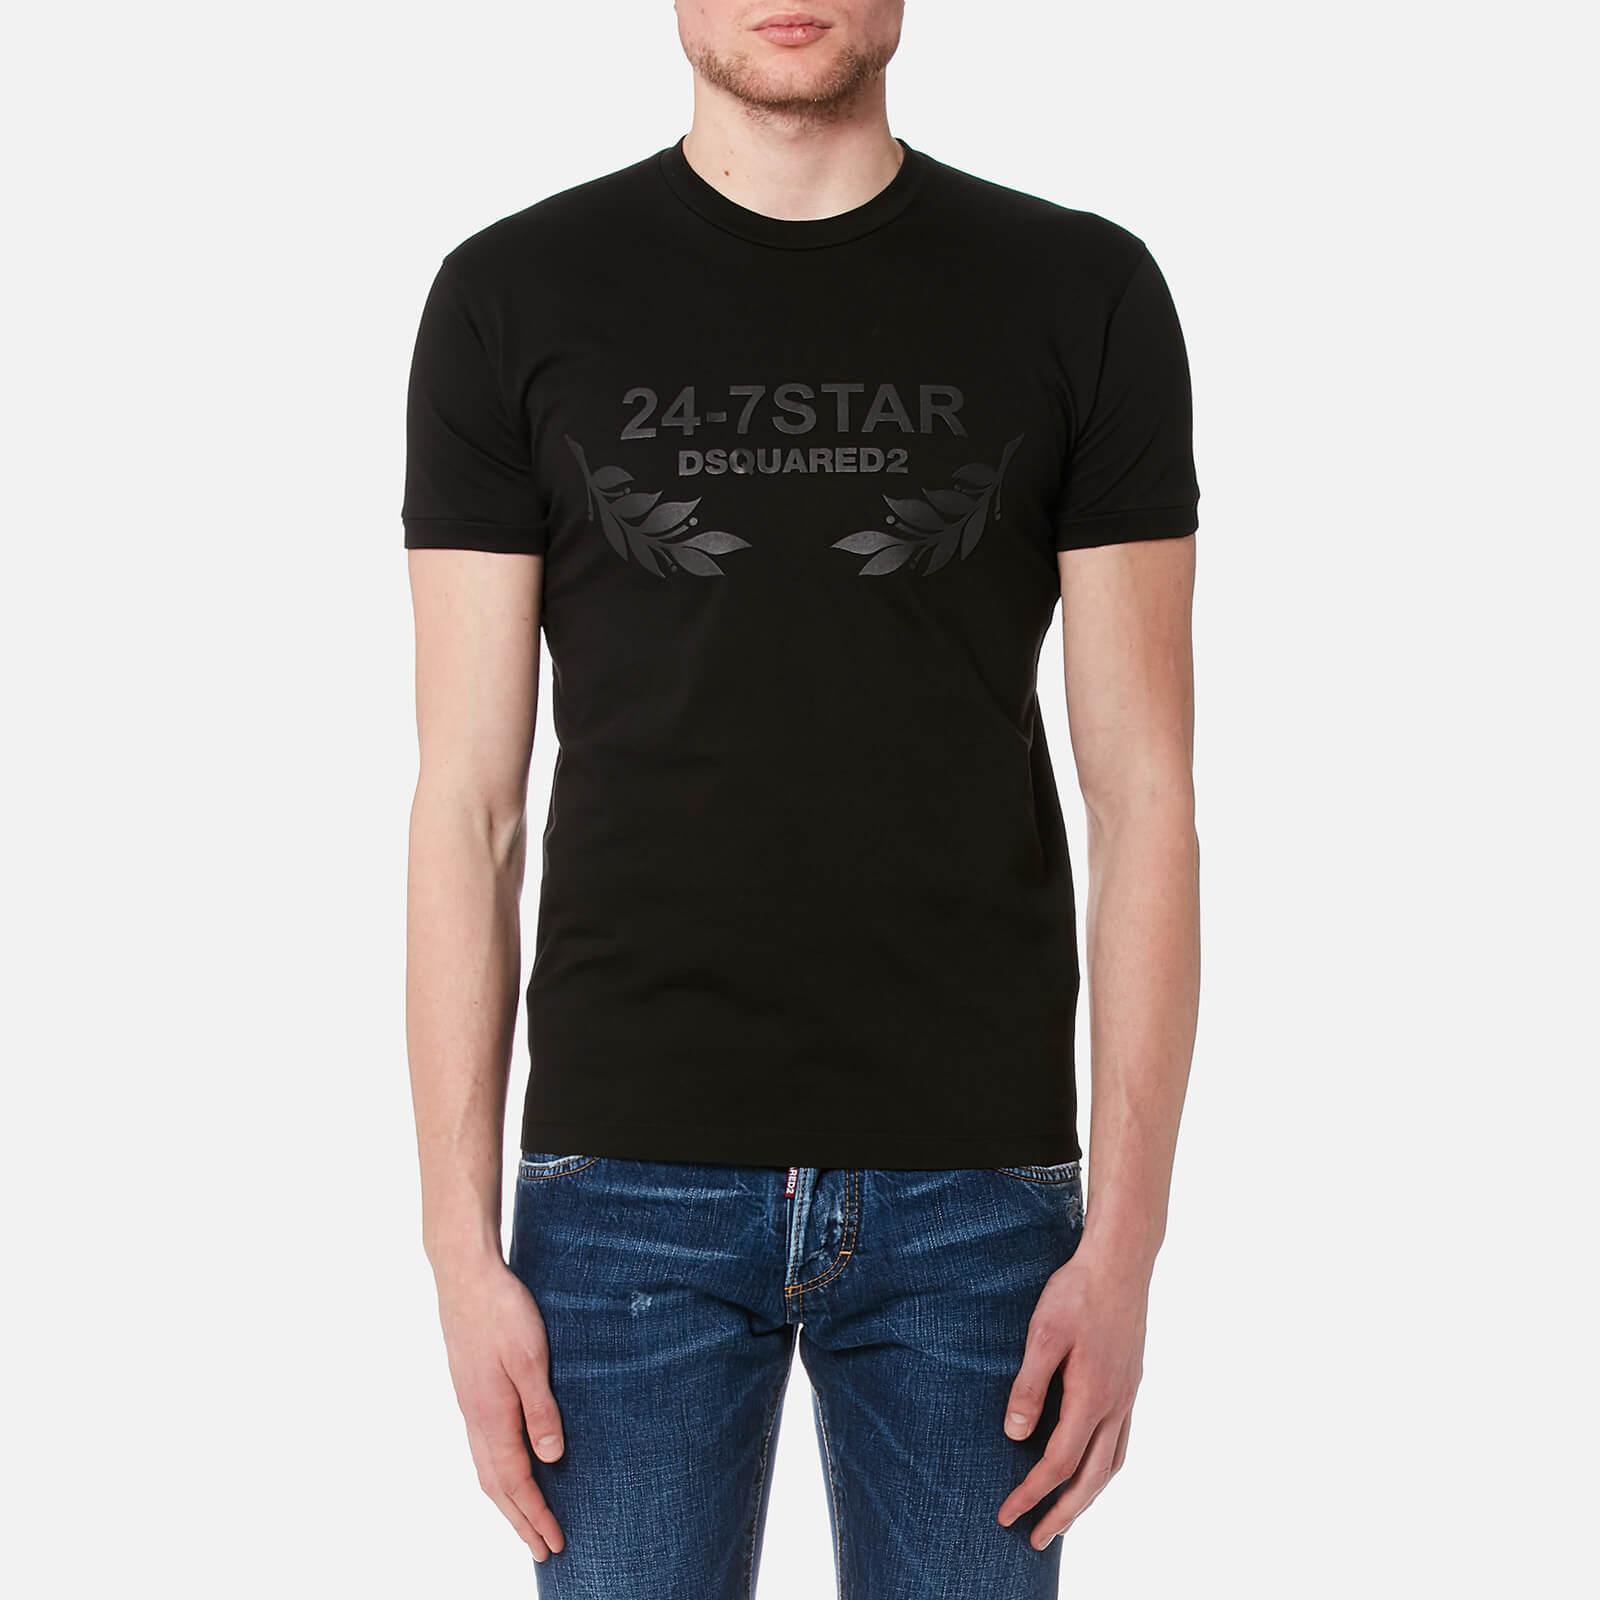 c7cf4f7636bcb0 Dsquared2 Men's 24-7 T-Shirt - Black - Free UK Delivery over £50